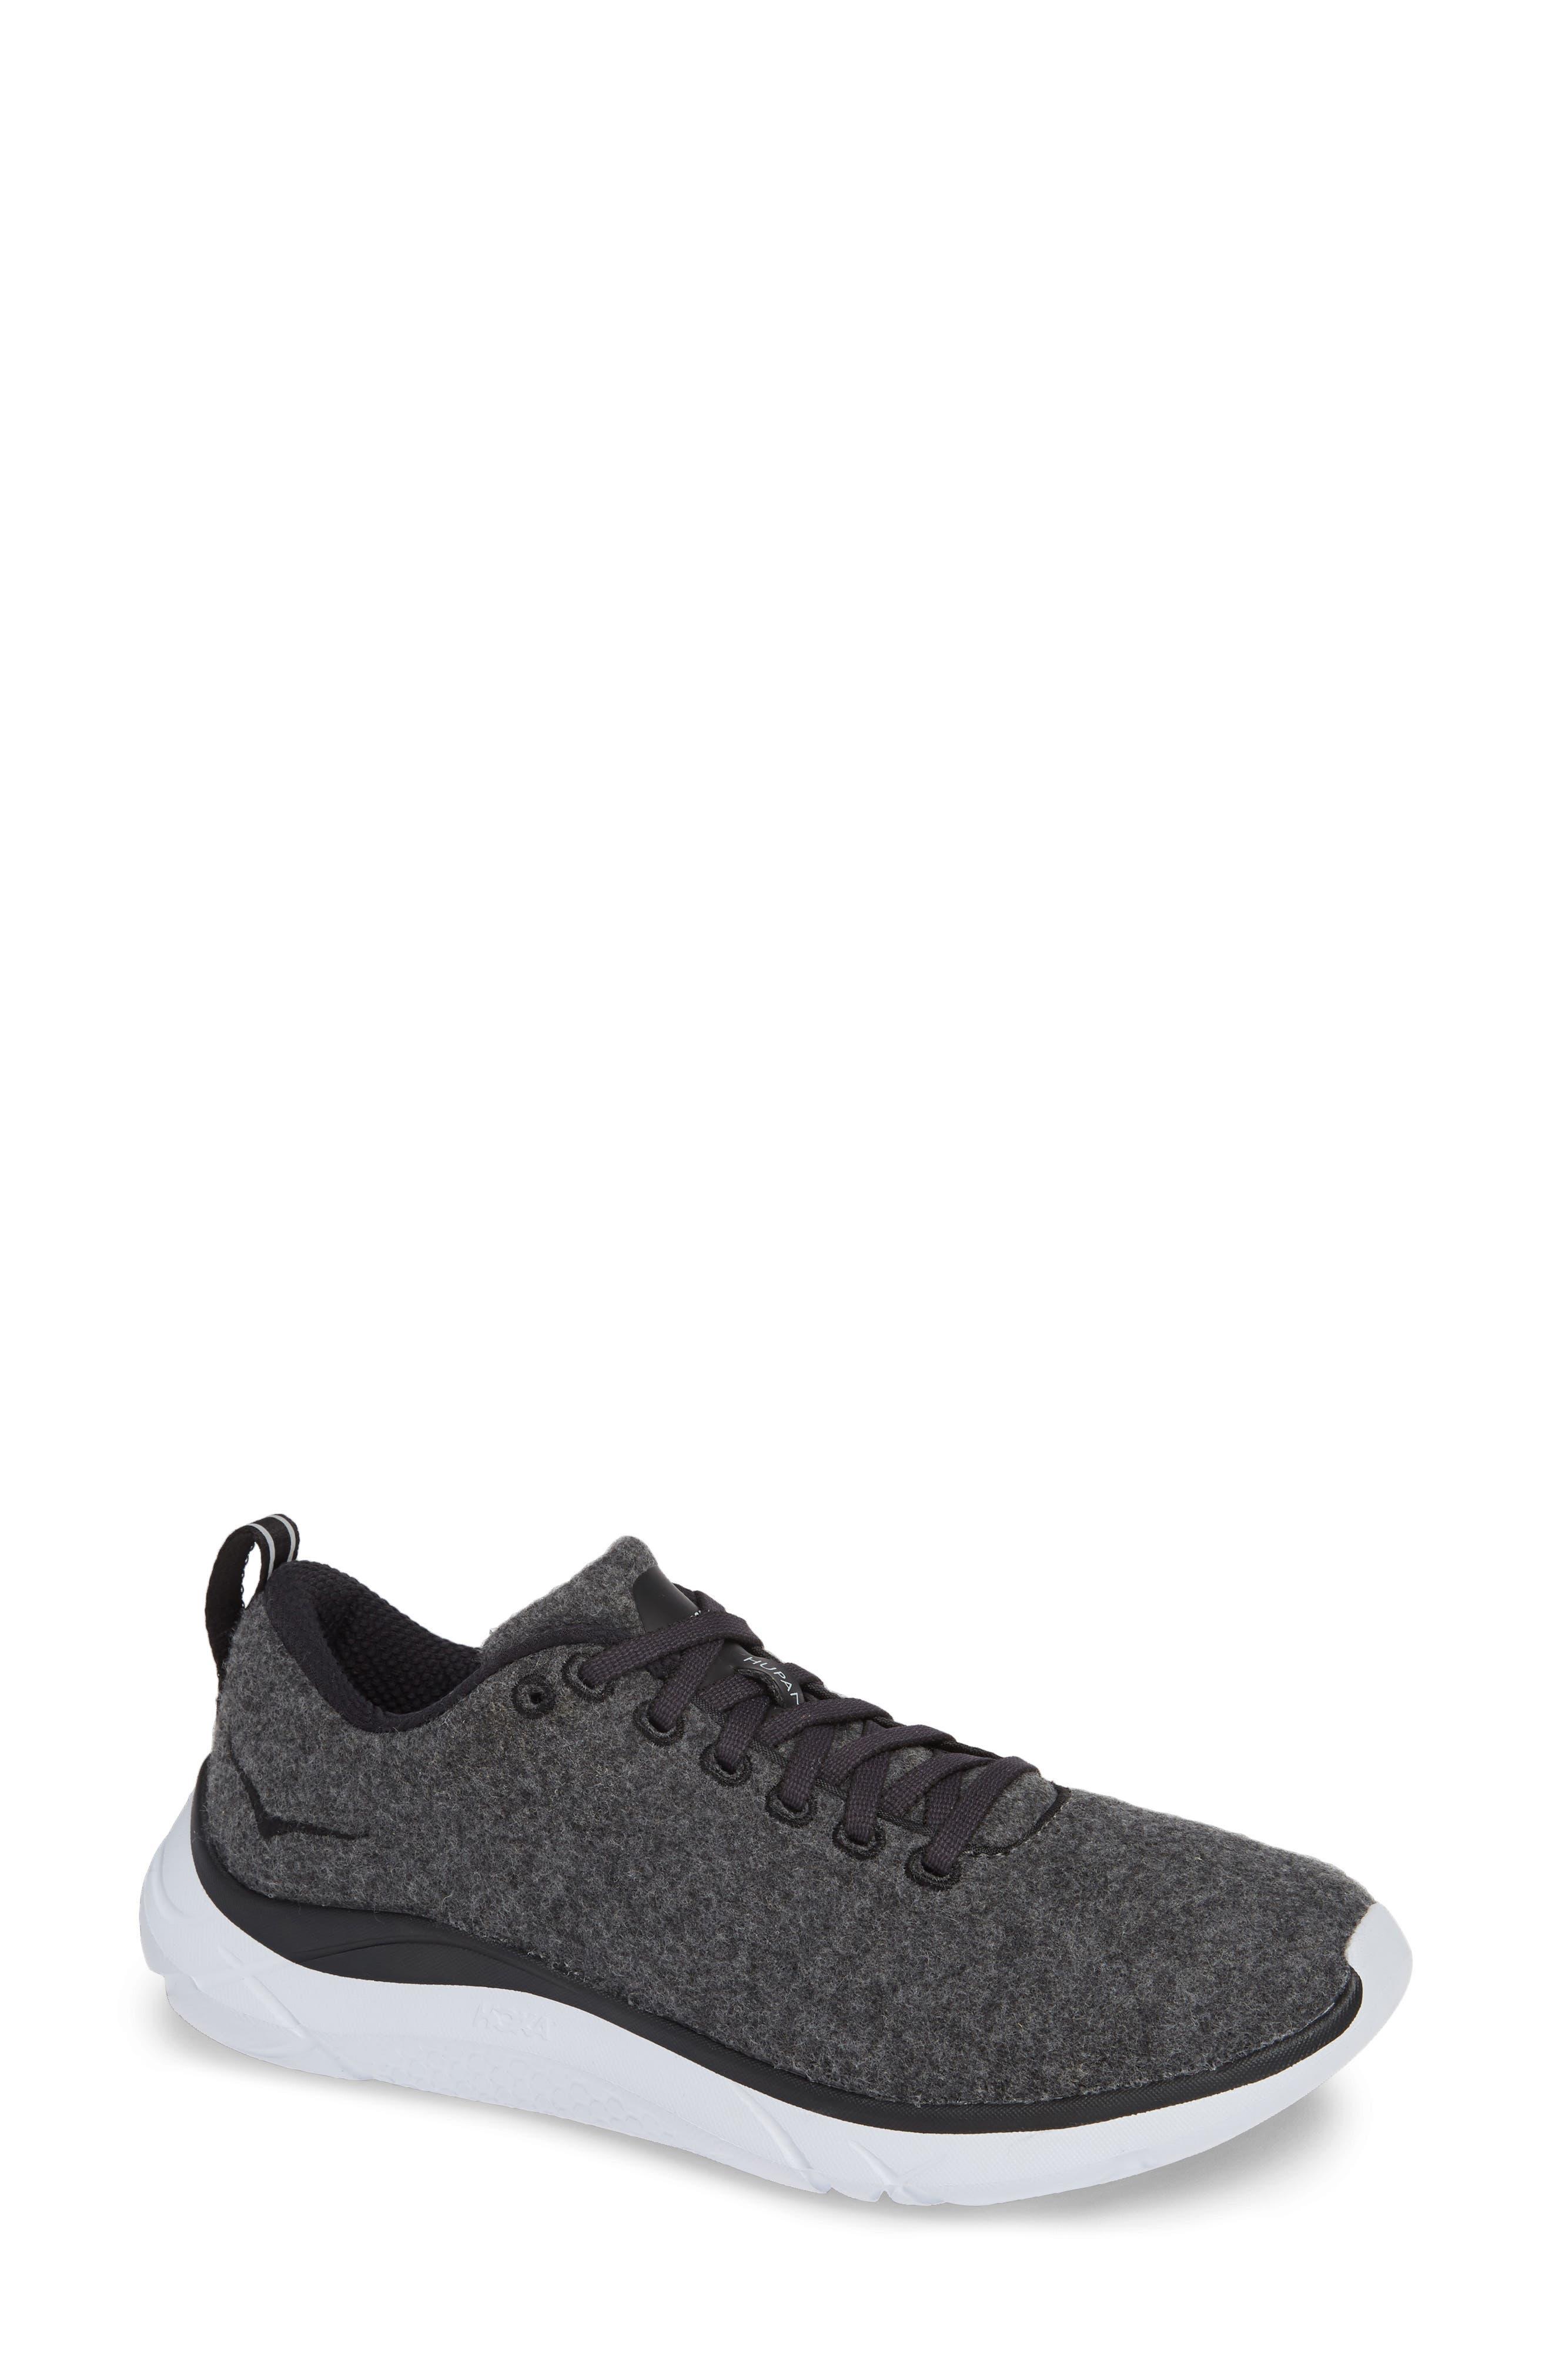 HOKA ONE ONE  Hupana Wool Sneaker, Main, color, 023